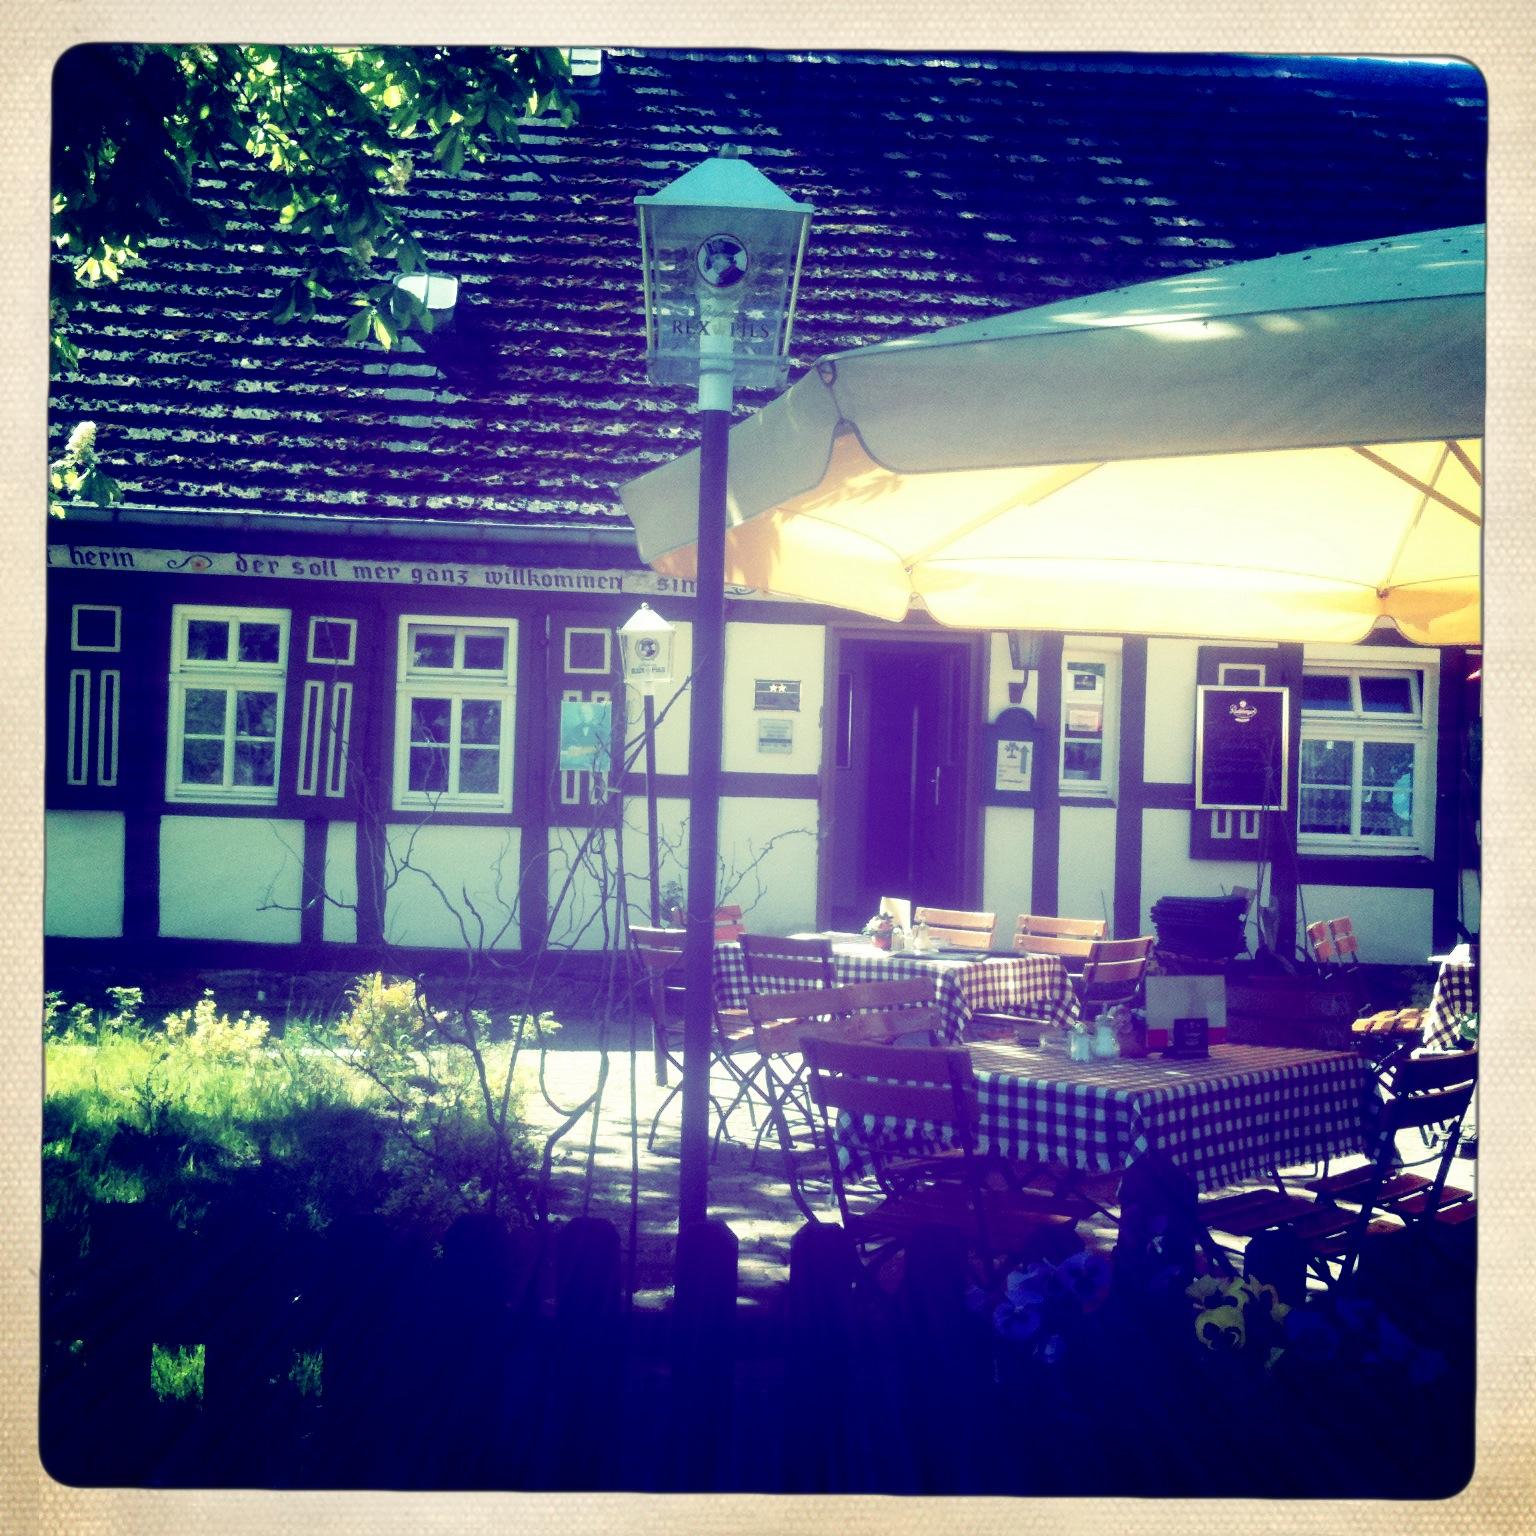 Die Terasse des Fontane-Haus in Neuglobsow am Stechlinsee